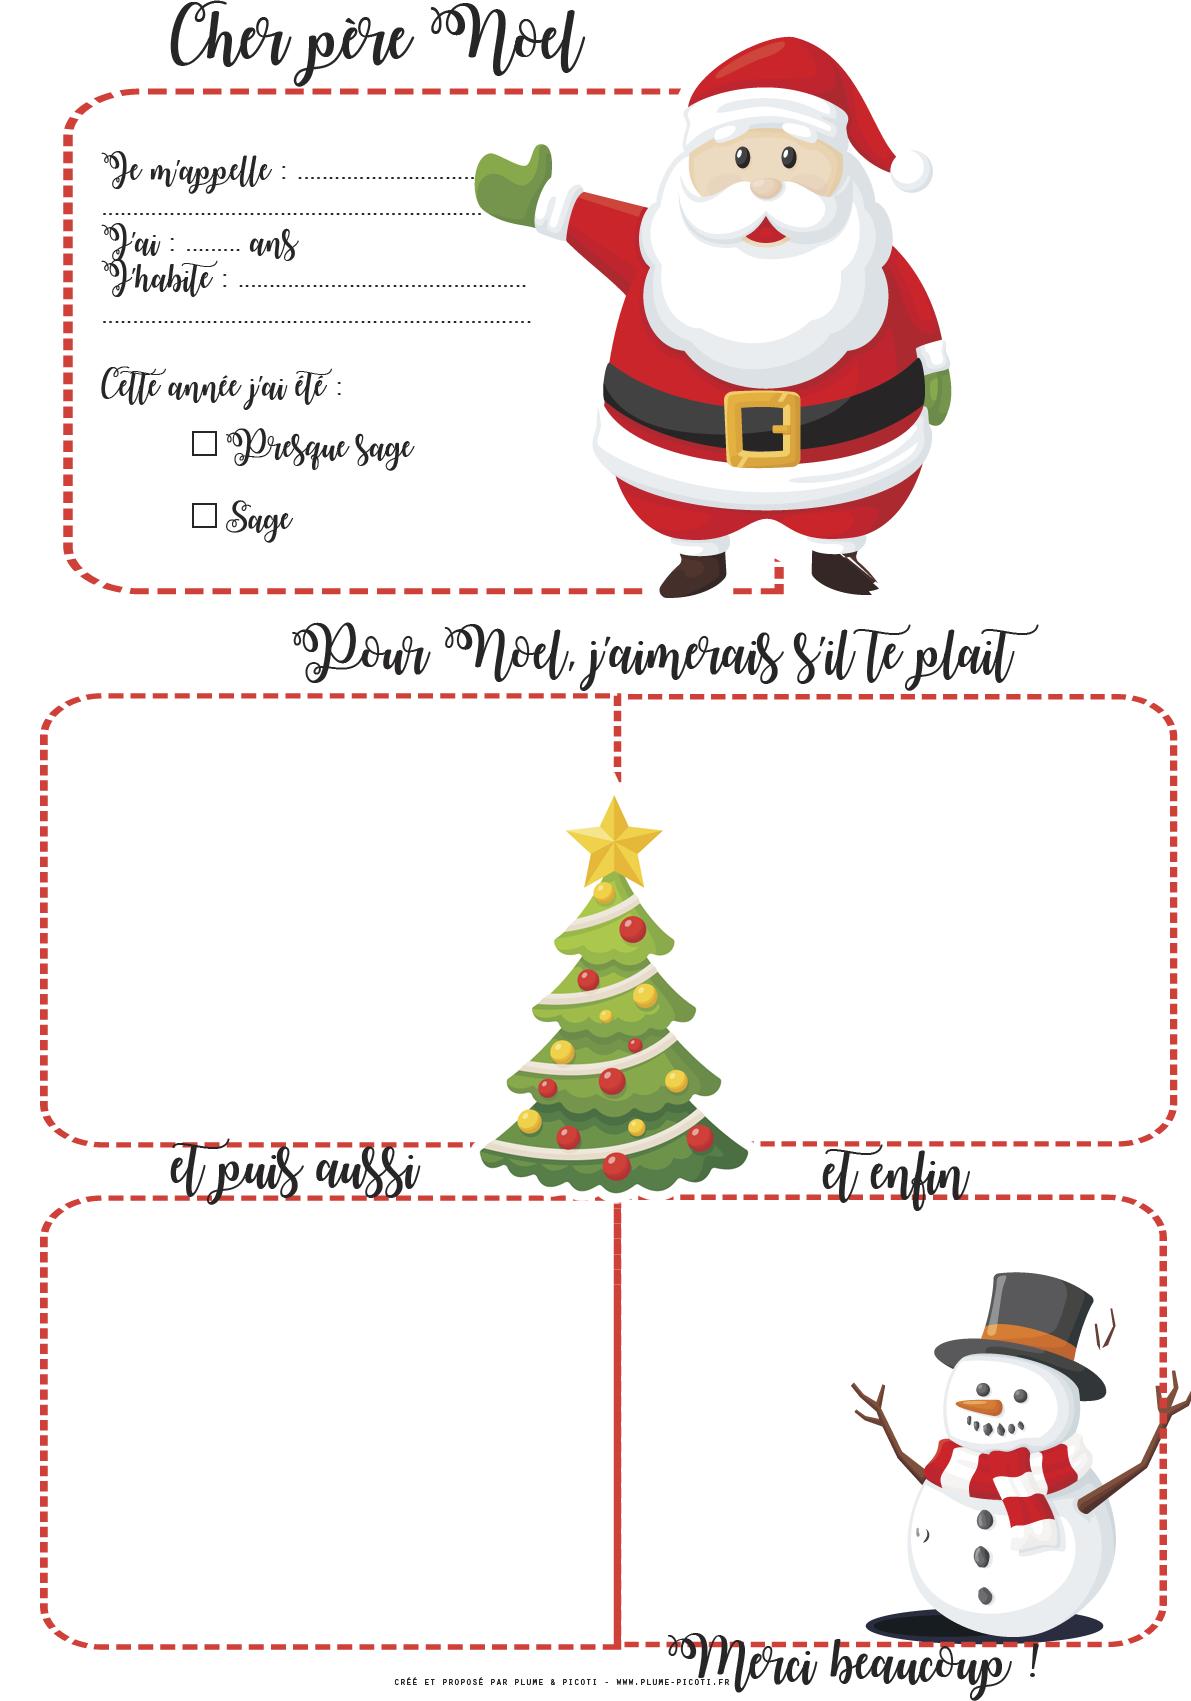 Liste Pere Noel Lettre au pre Nol imprimer | Christmas cards kids, Santa letter